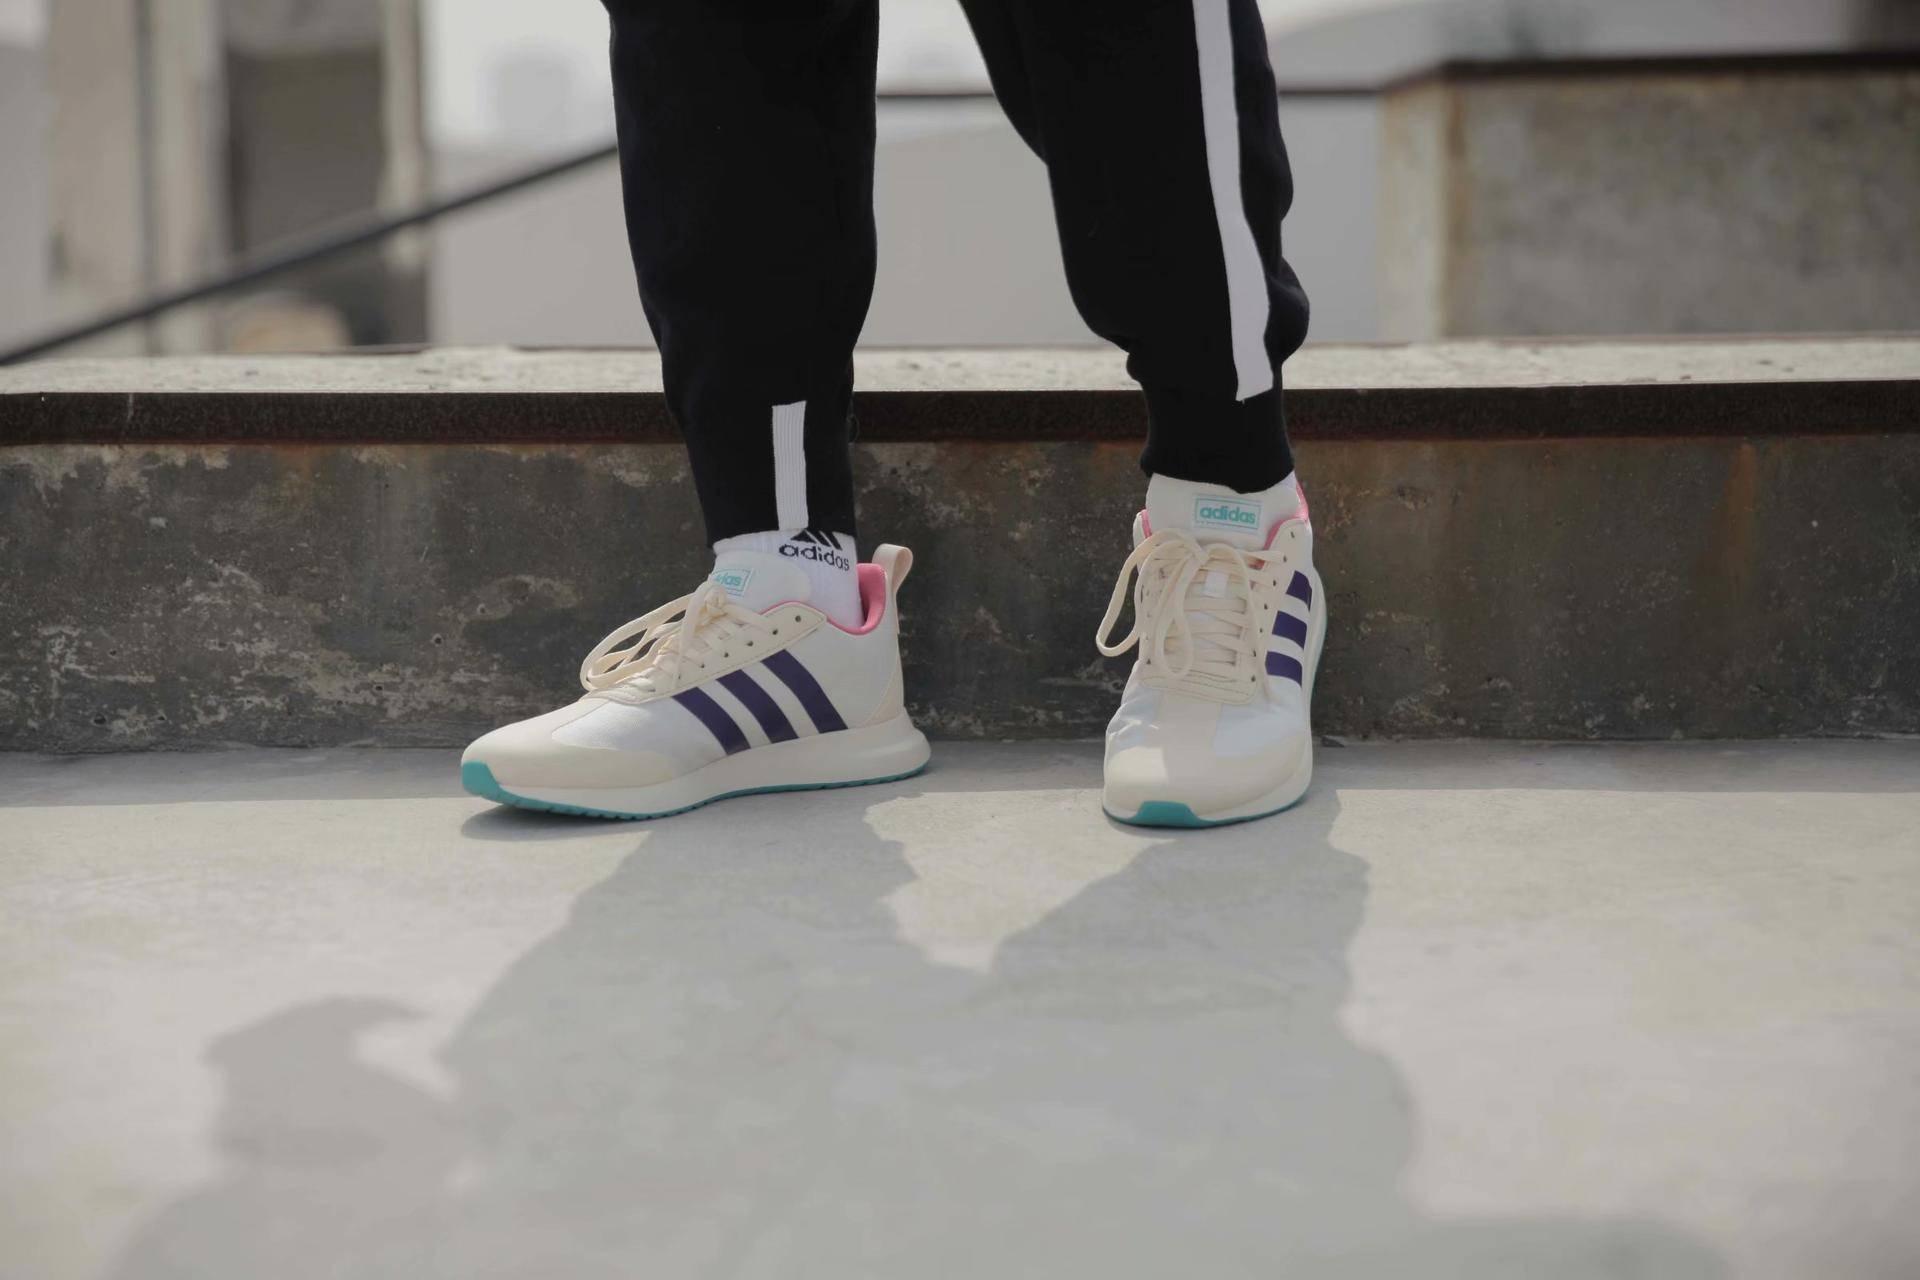 adidas neo让你魅力气场全开